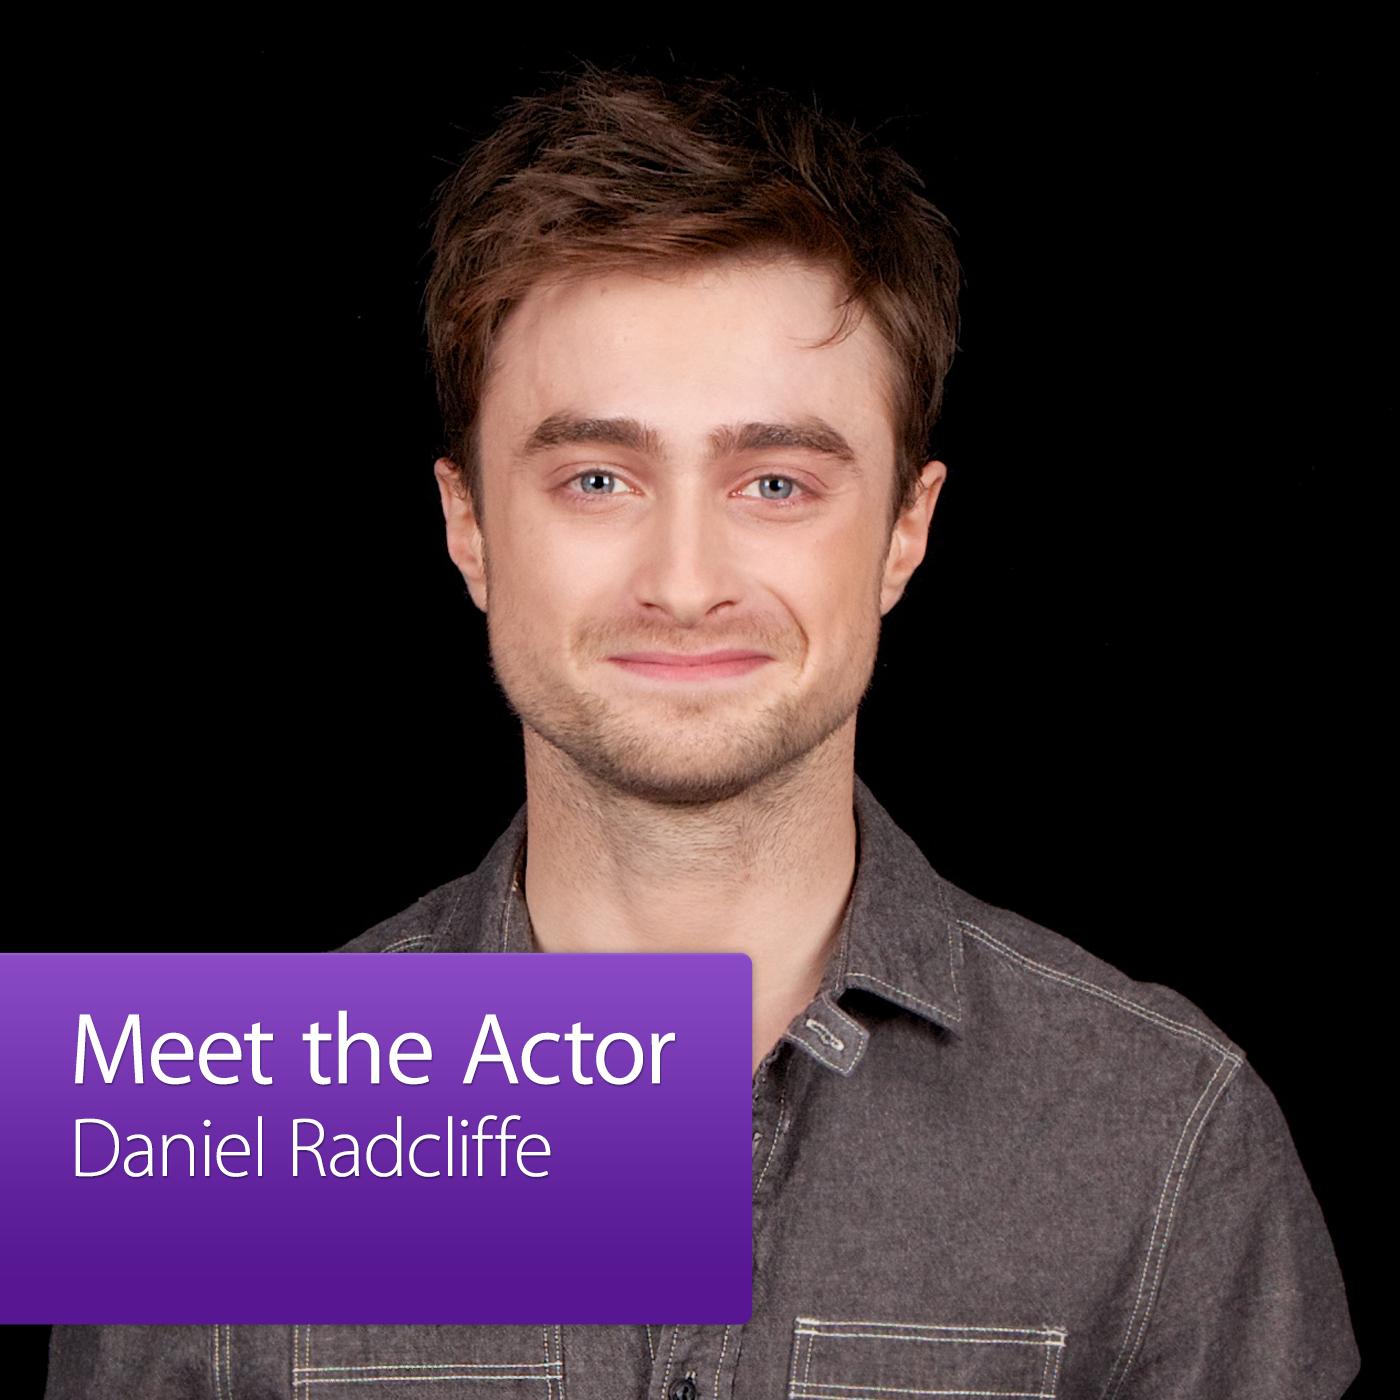 Daniel Radcliffe: Meet the Actor